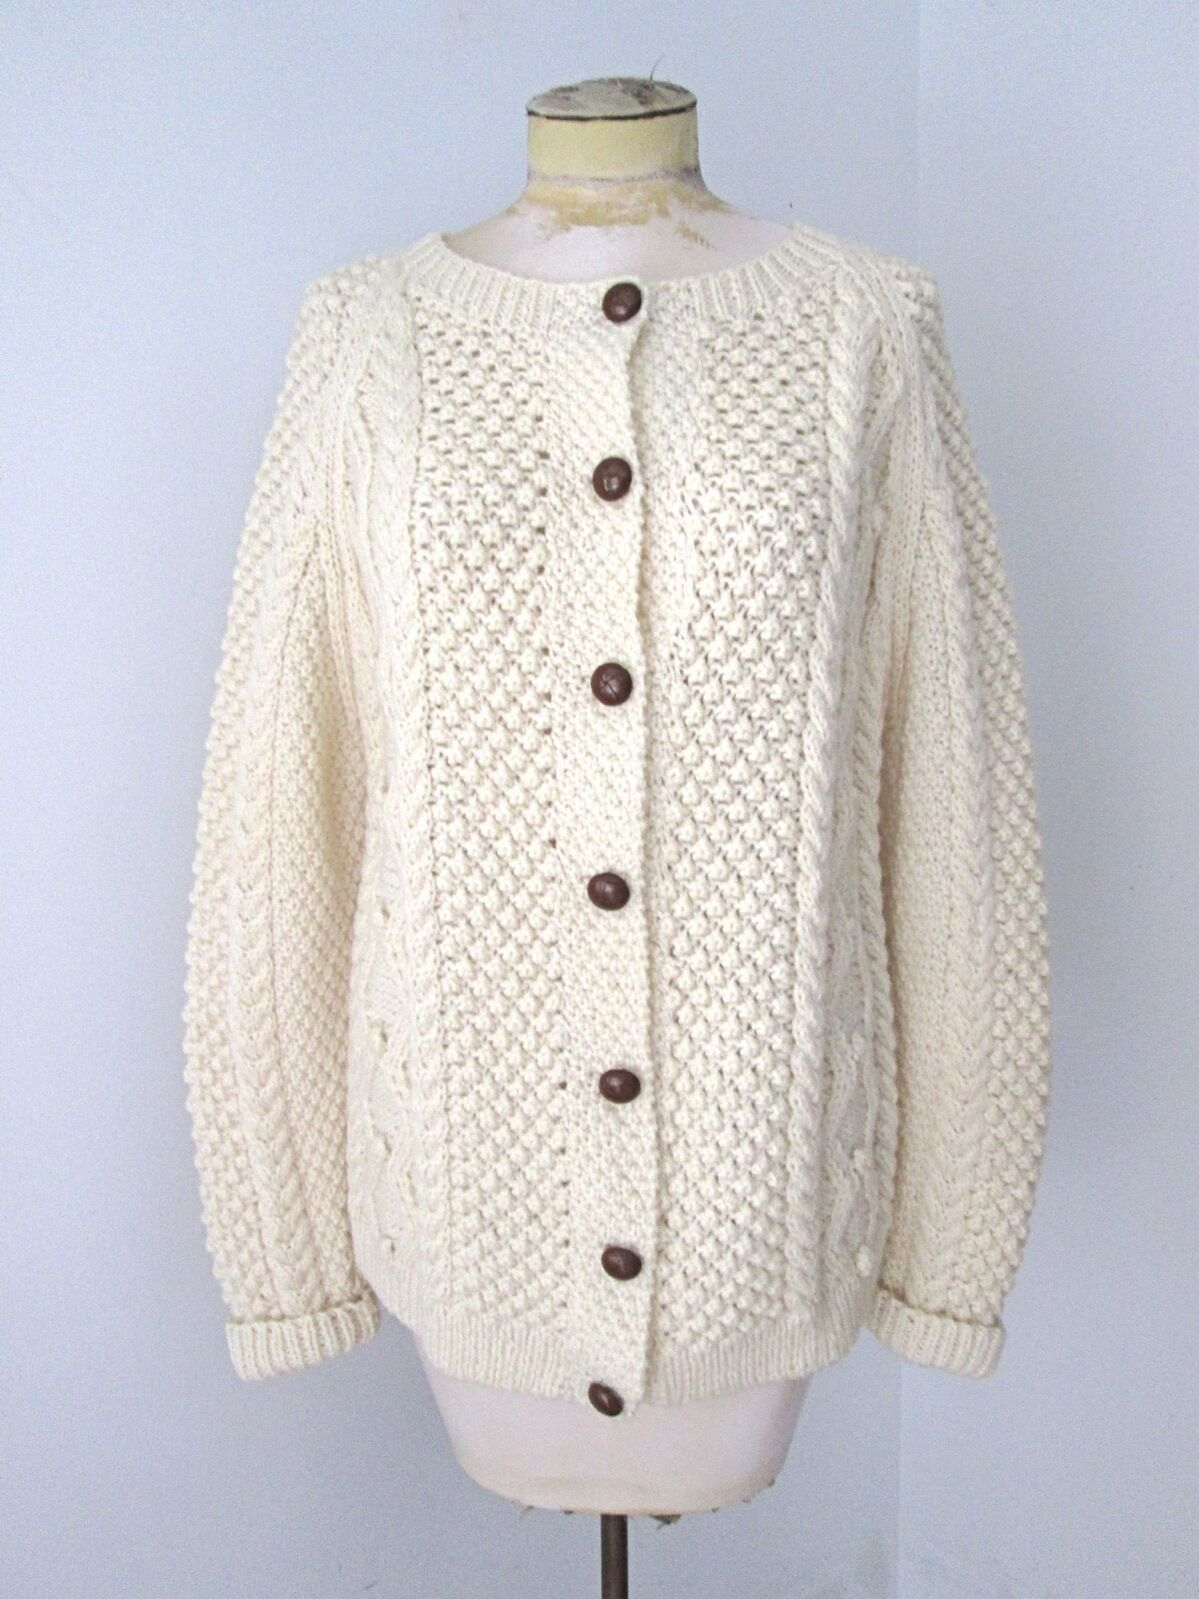 VGC Ivory Wool Aran Fisherman Heavy Chunky Cardigan Sweater M